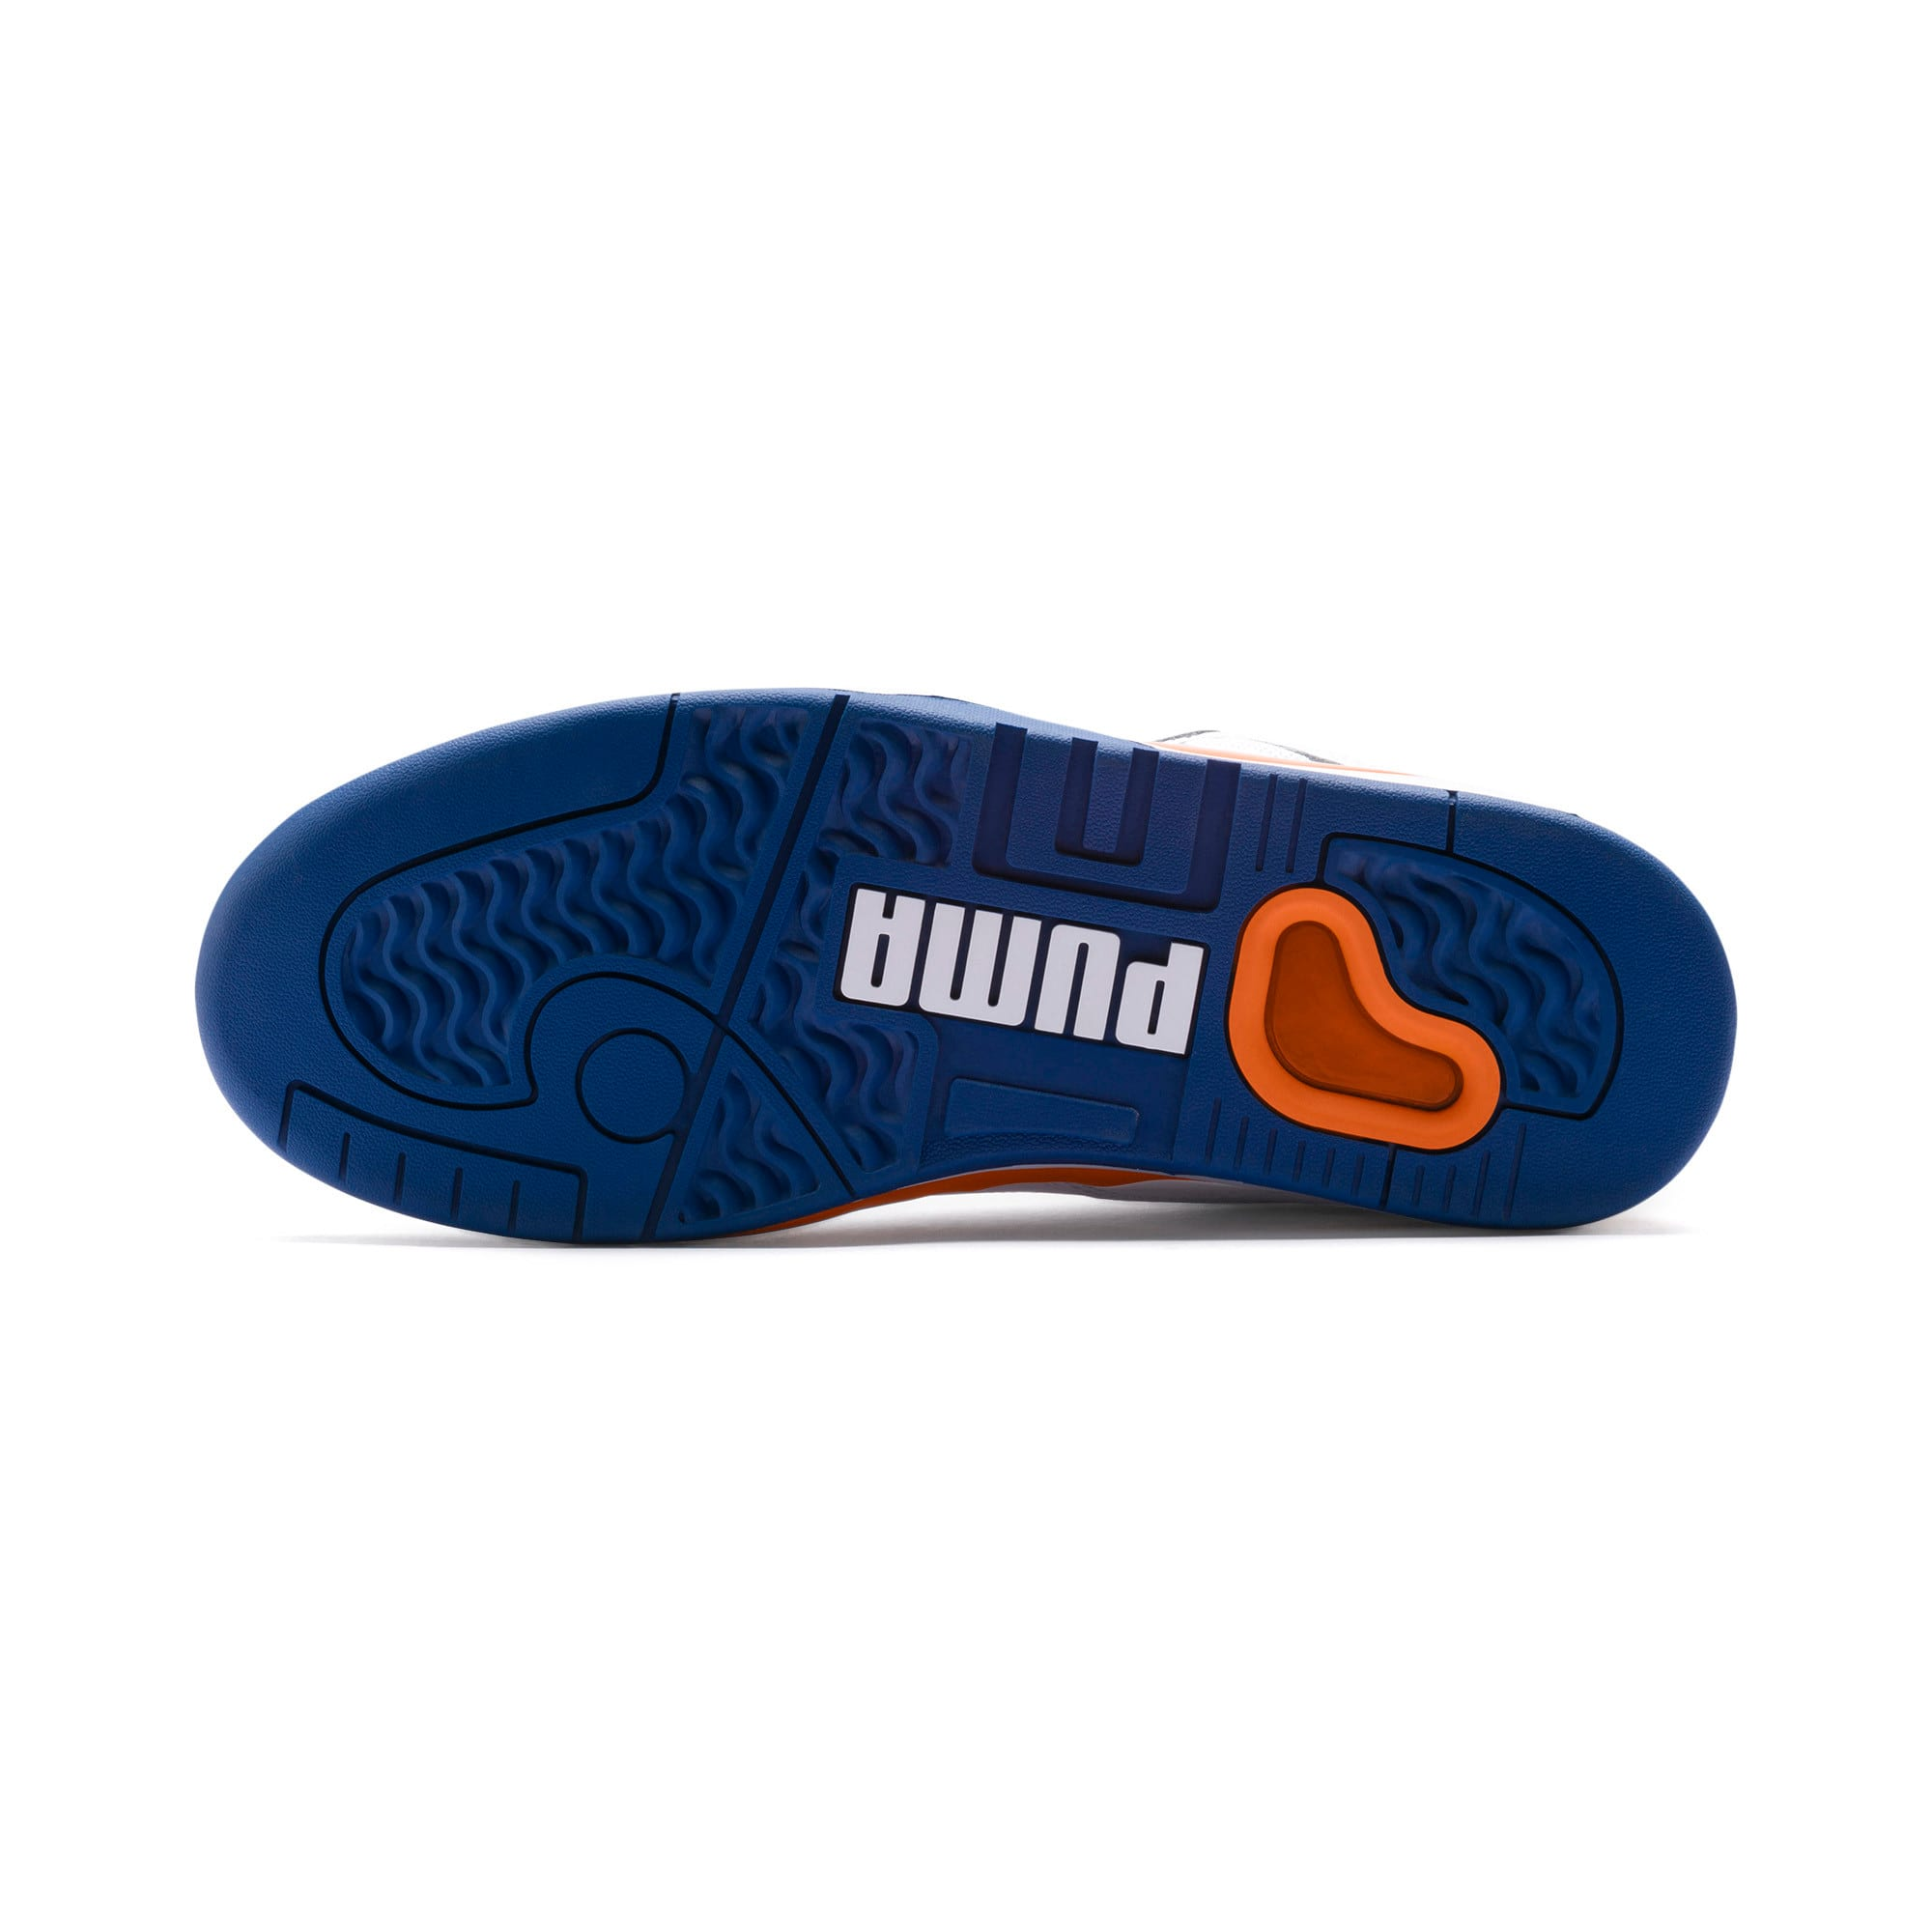 Thumbnail 4 of Palace Guard basketbalschoenen voor heren, P White-Jaffa Orange-G Blue, medium